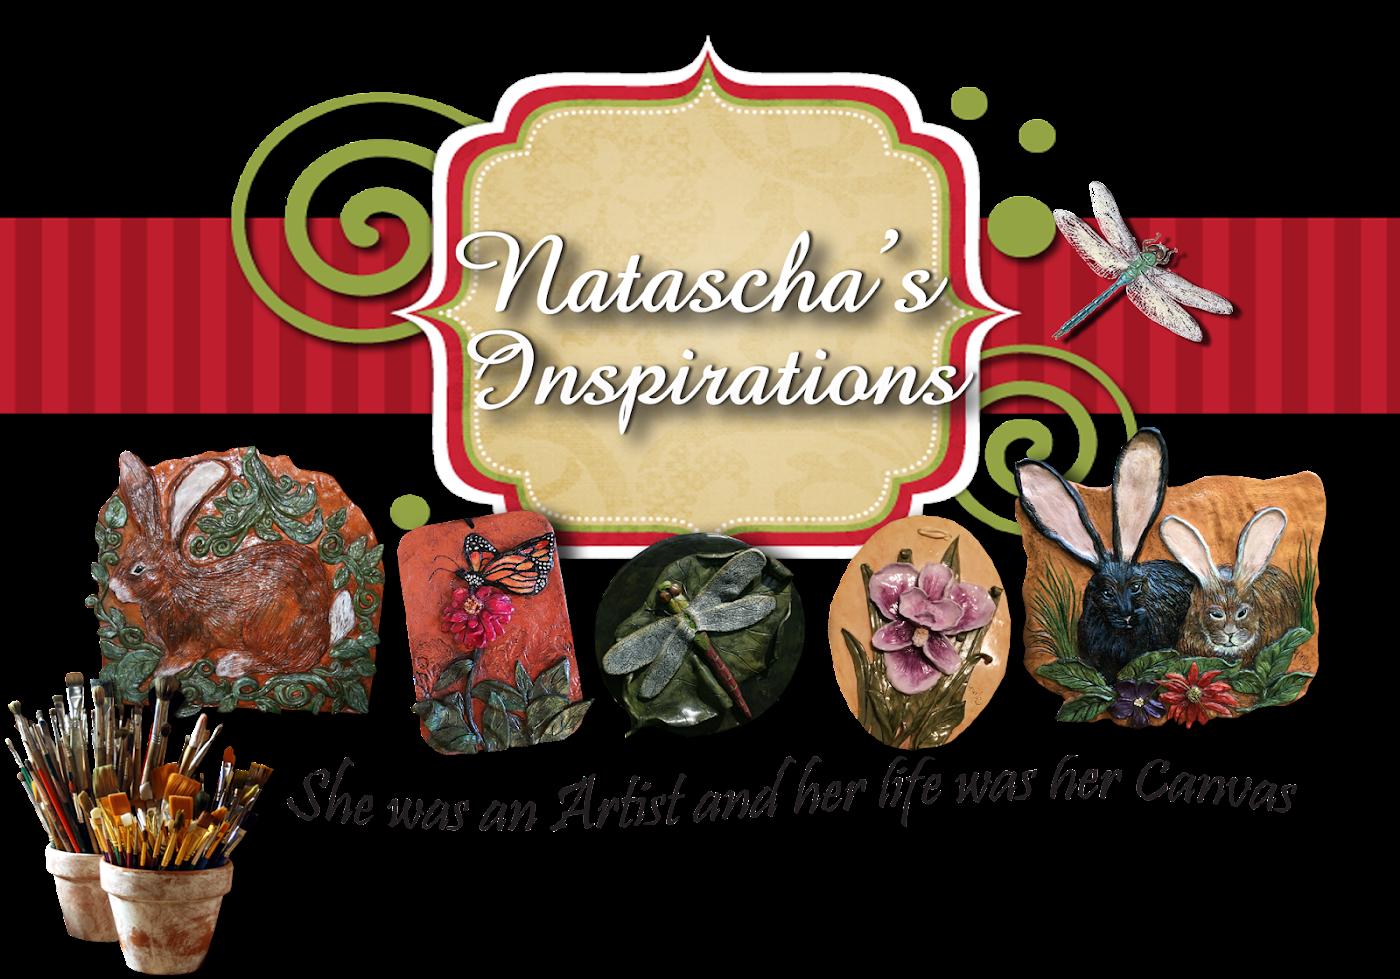 Natascha's Inspirations